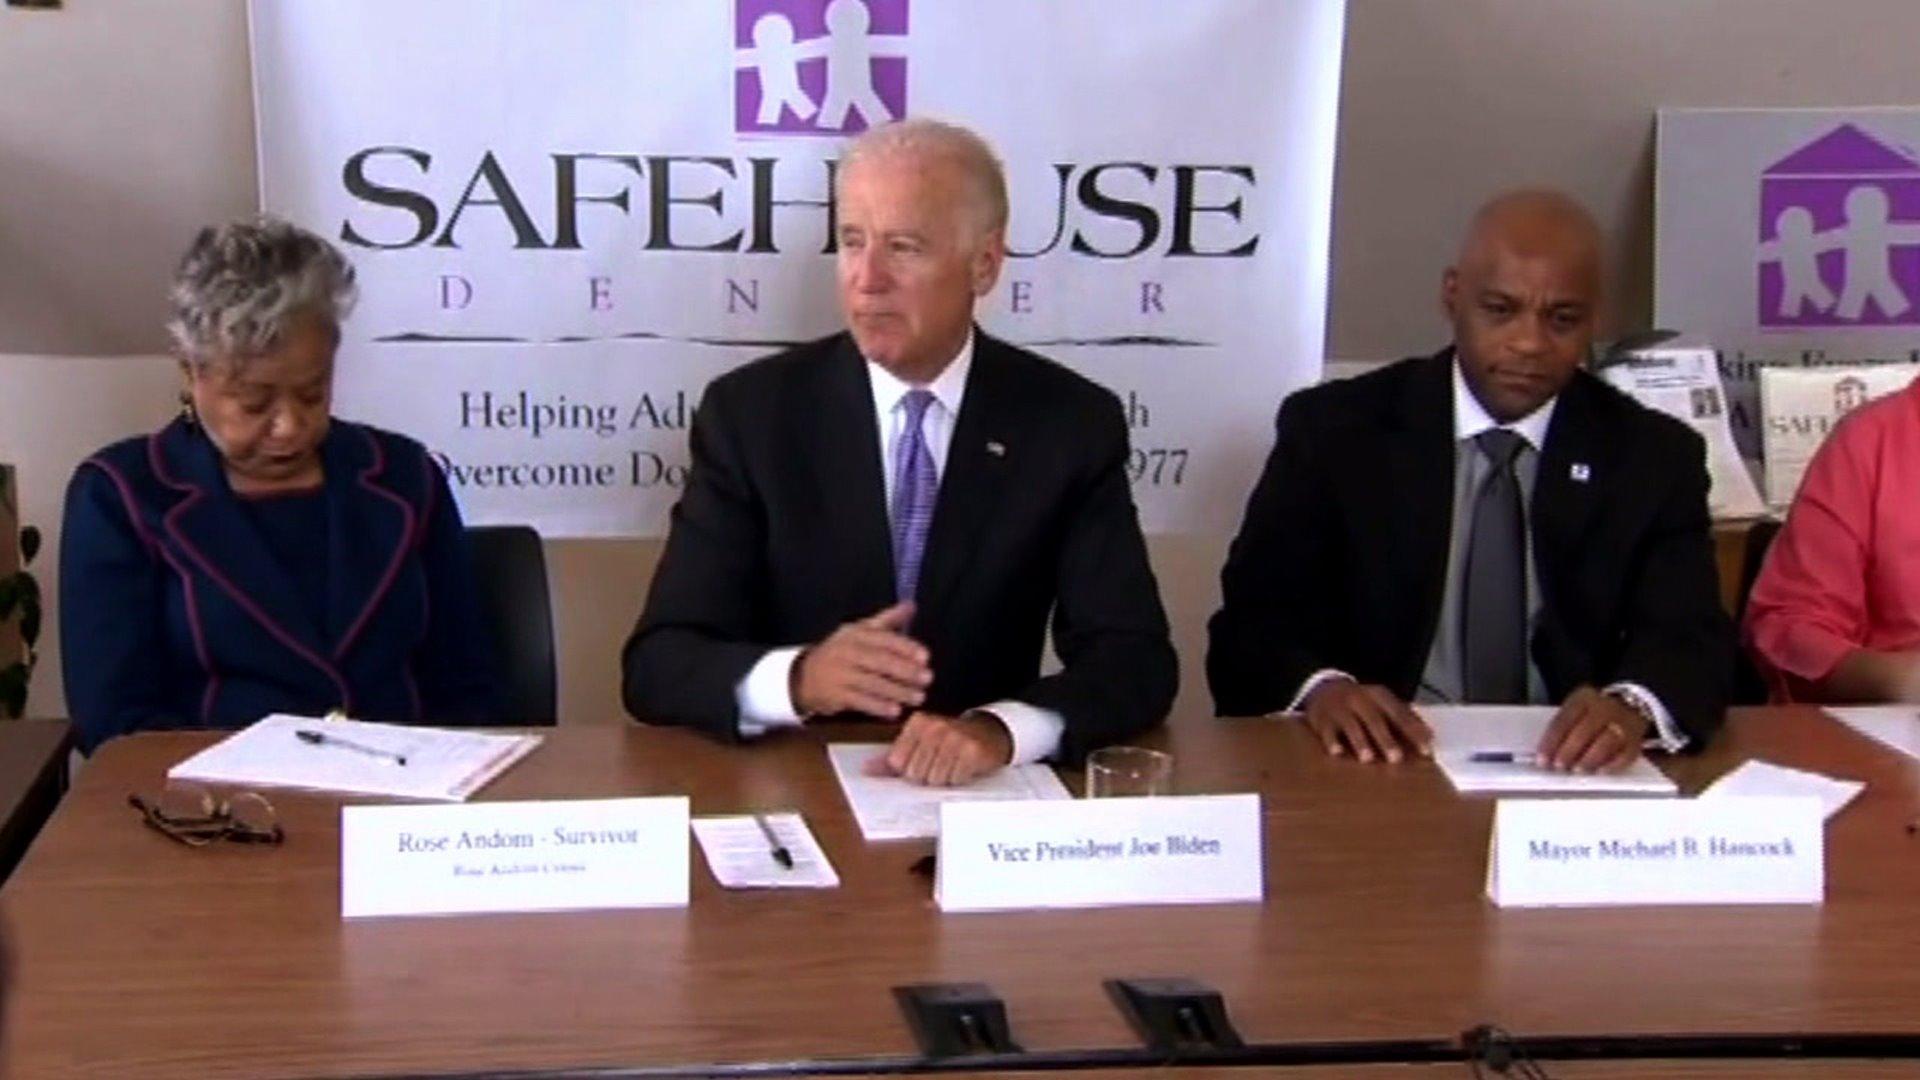 Vice President Joe Biden at domestic violence roundtable event in Denver